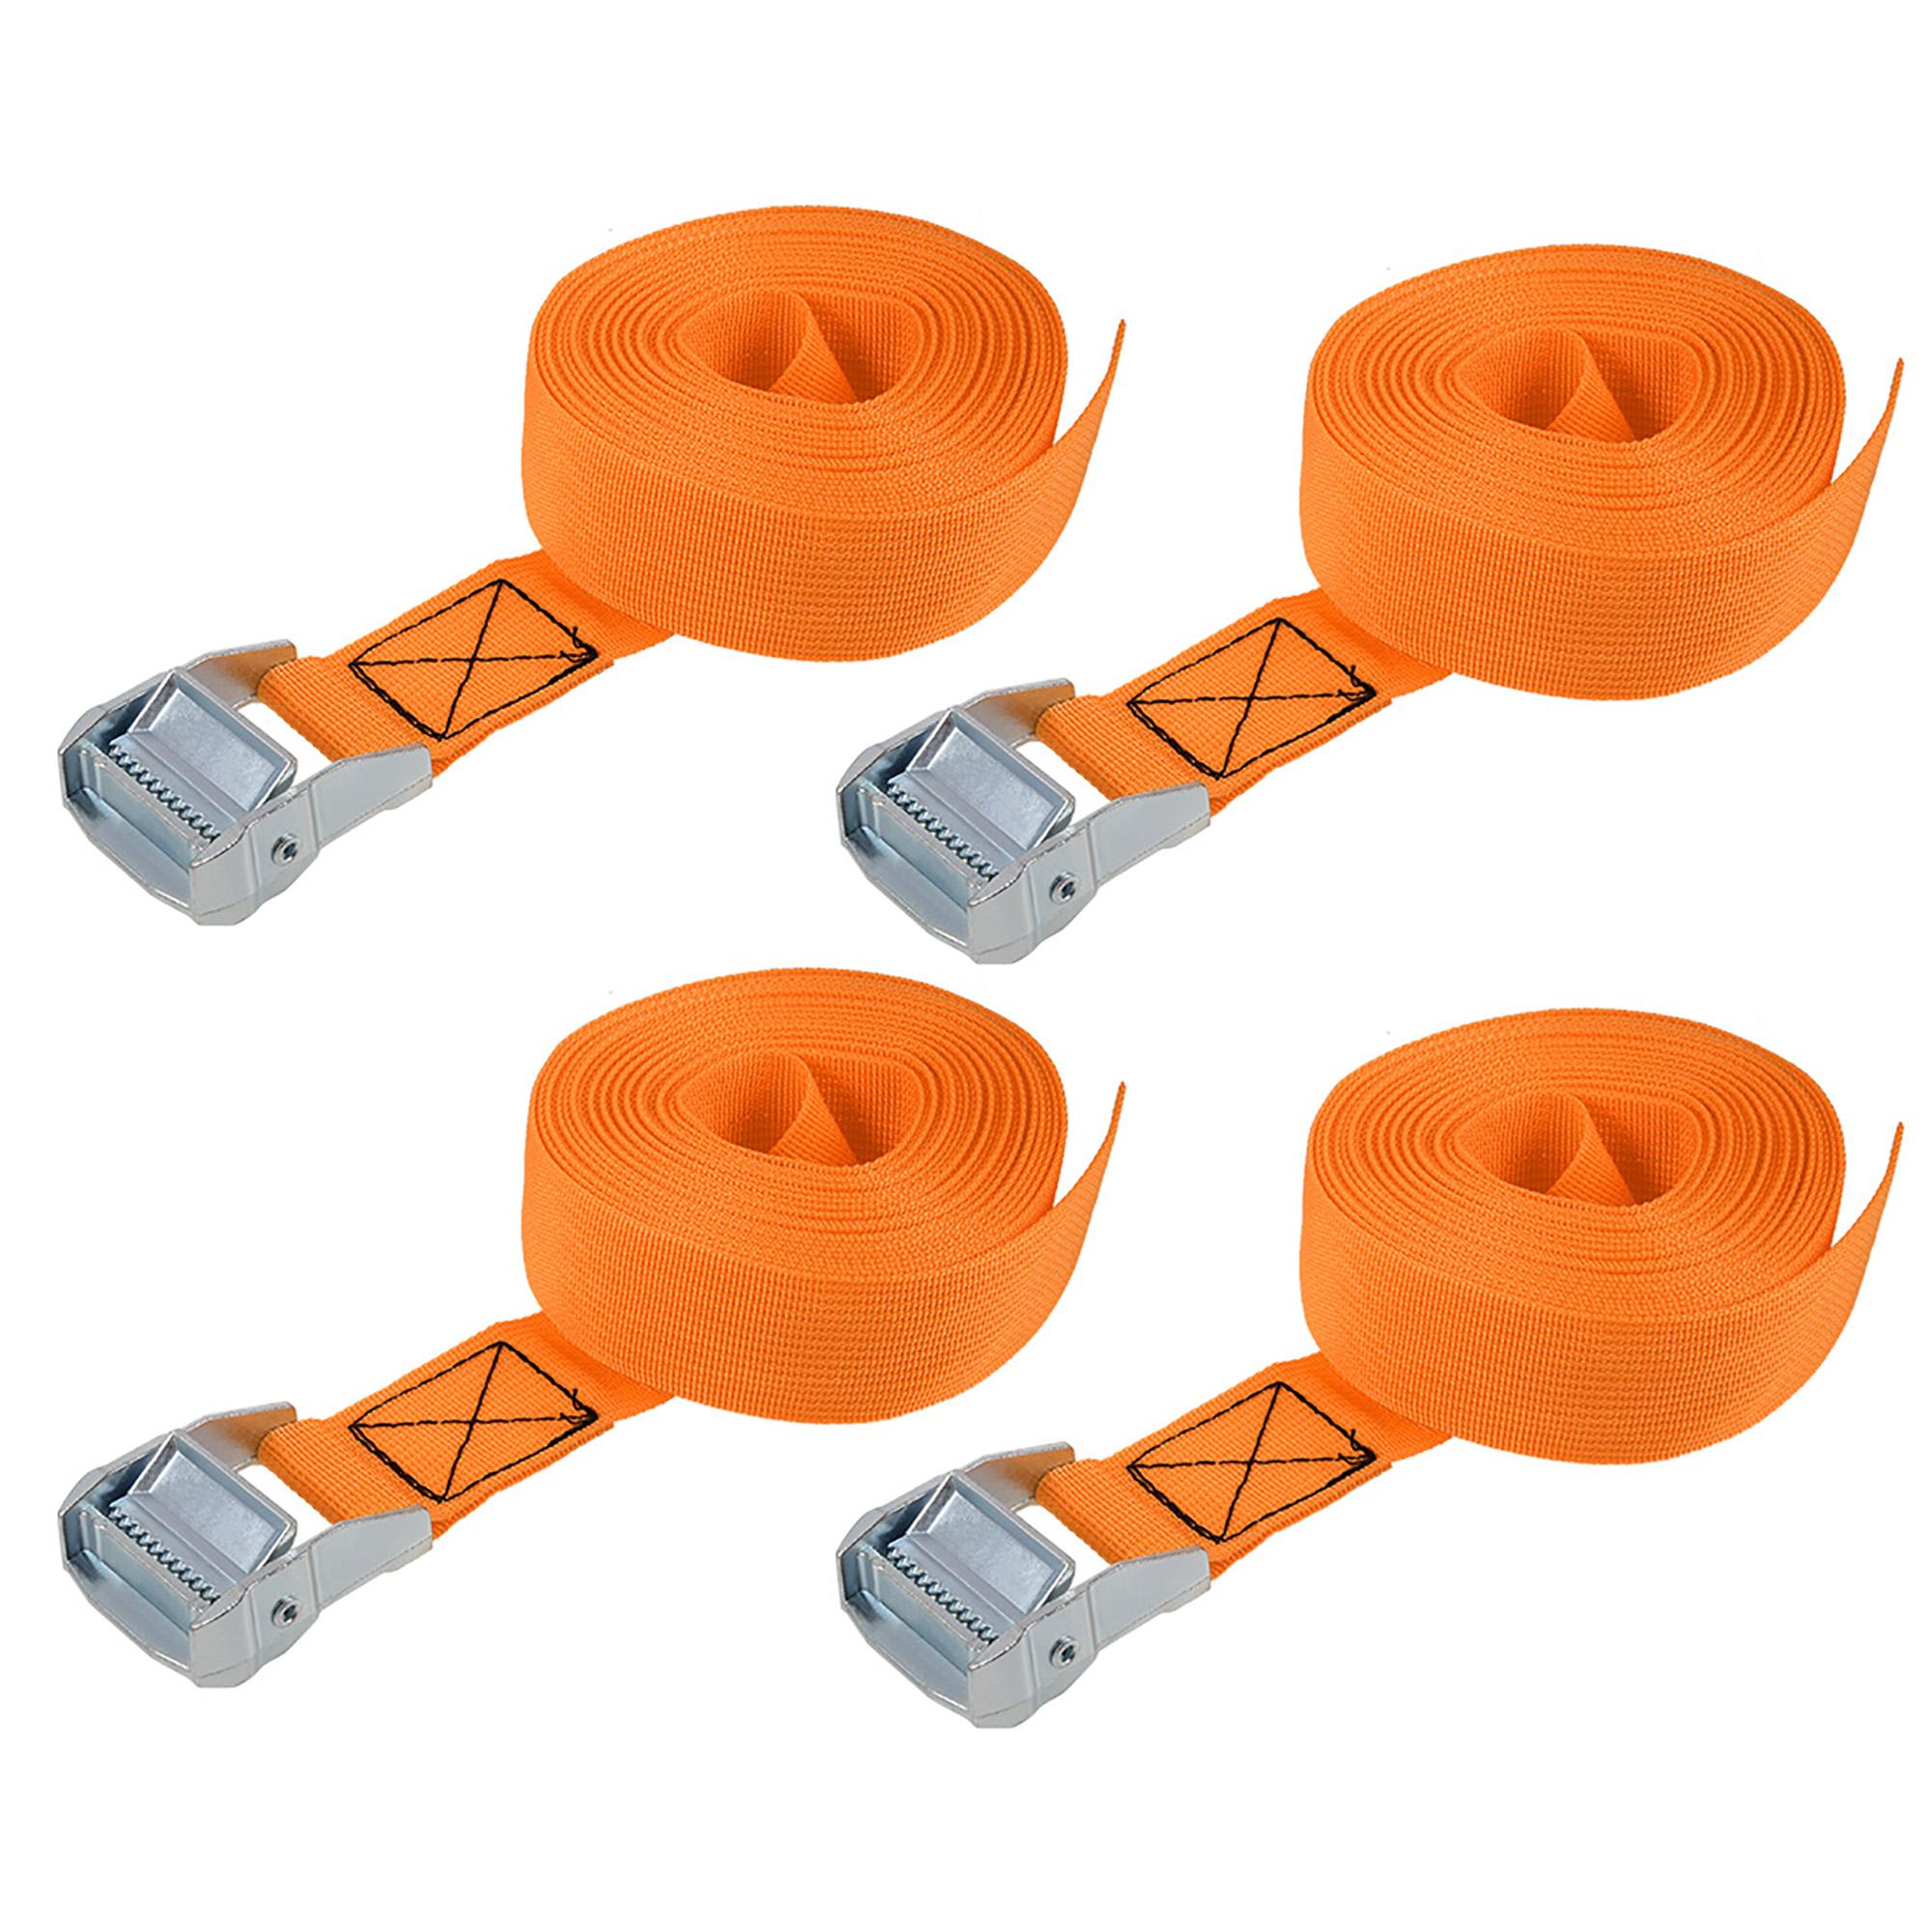 "Lashing Strap 1.5"" x 20' Cargo Tie Down Straps with Cam Lock Buckle Up to 1100lbs Orange 4 Pcs"